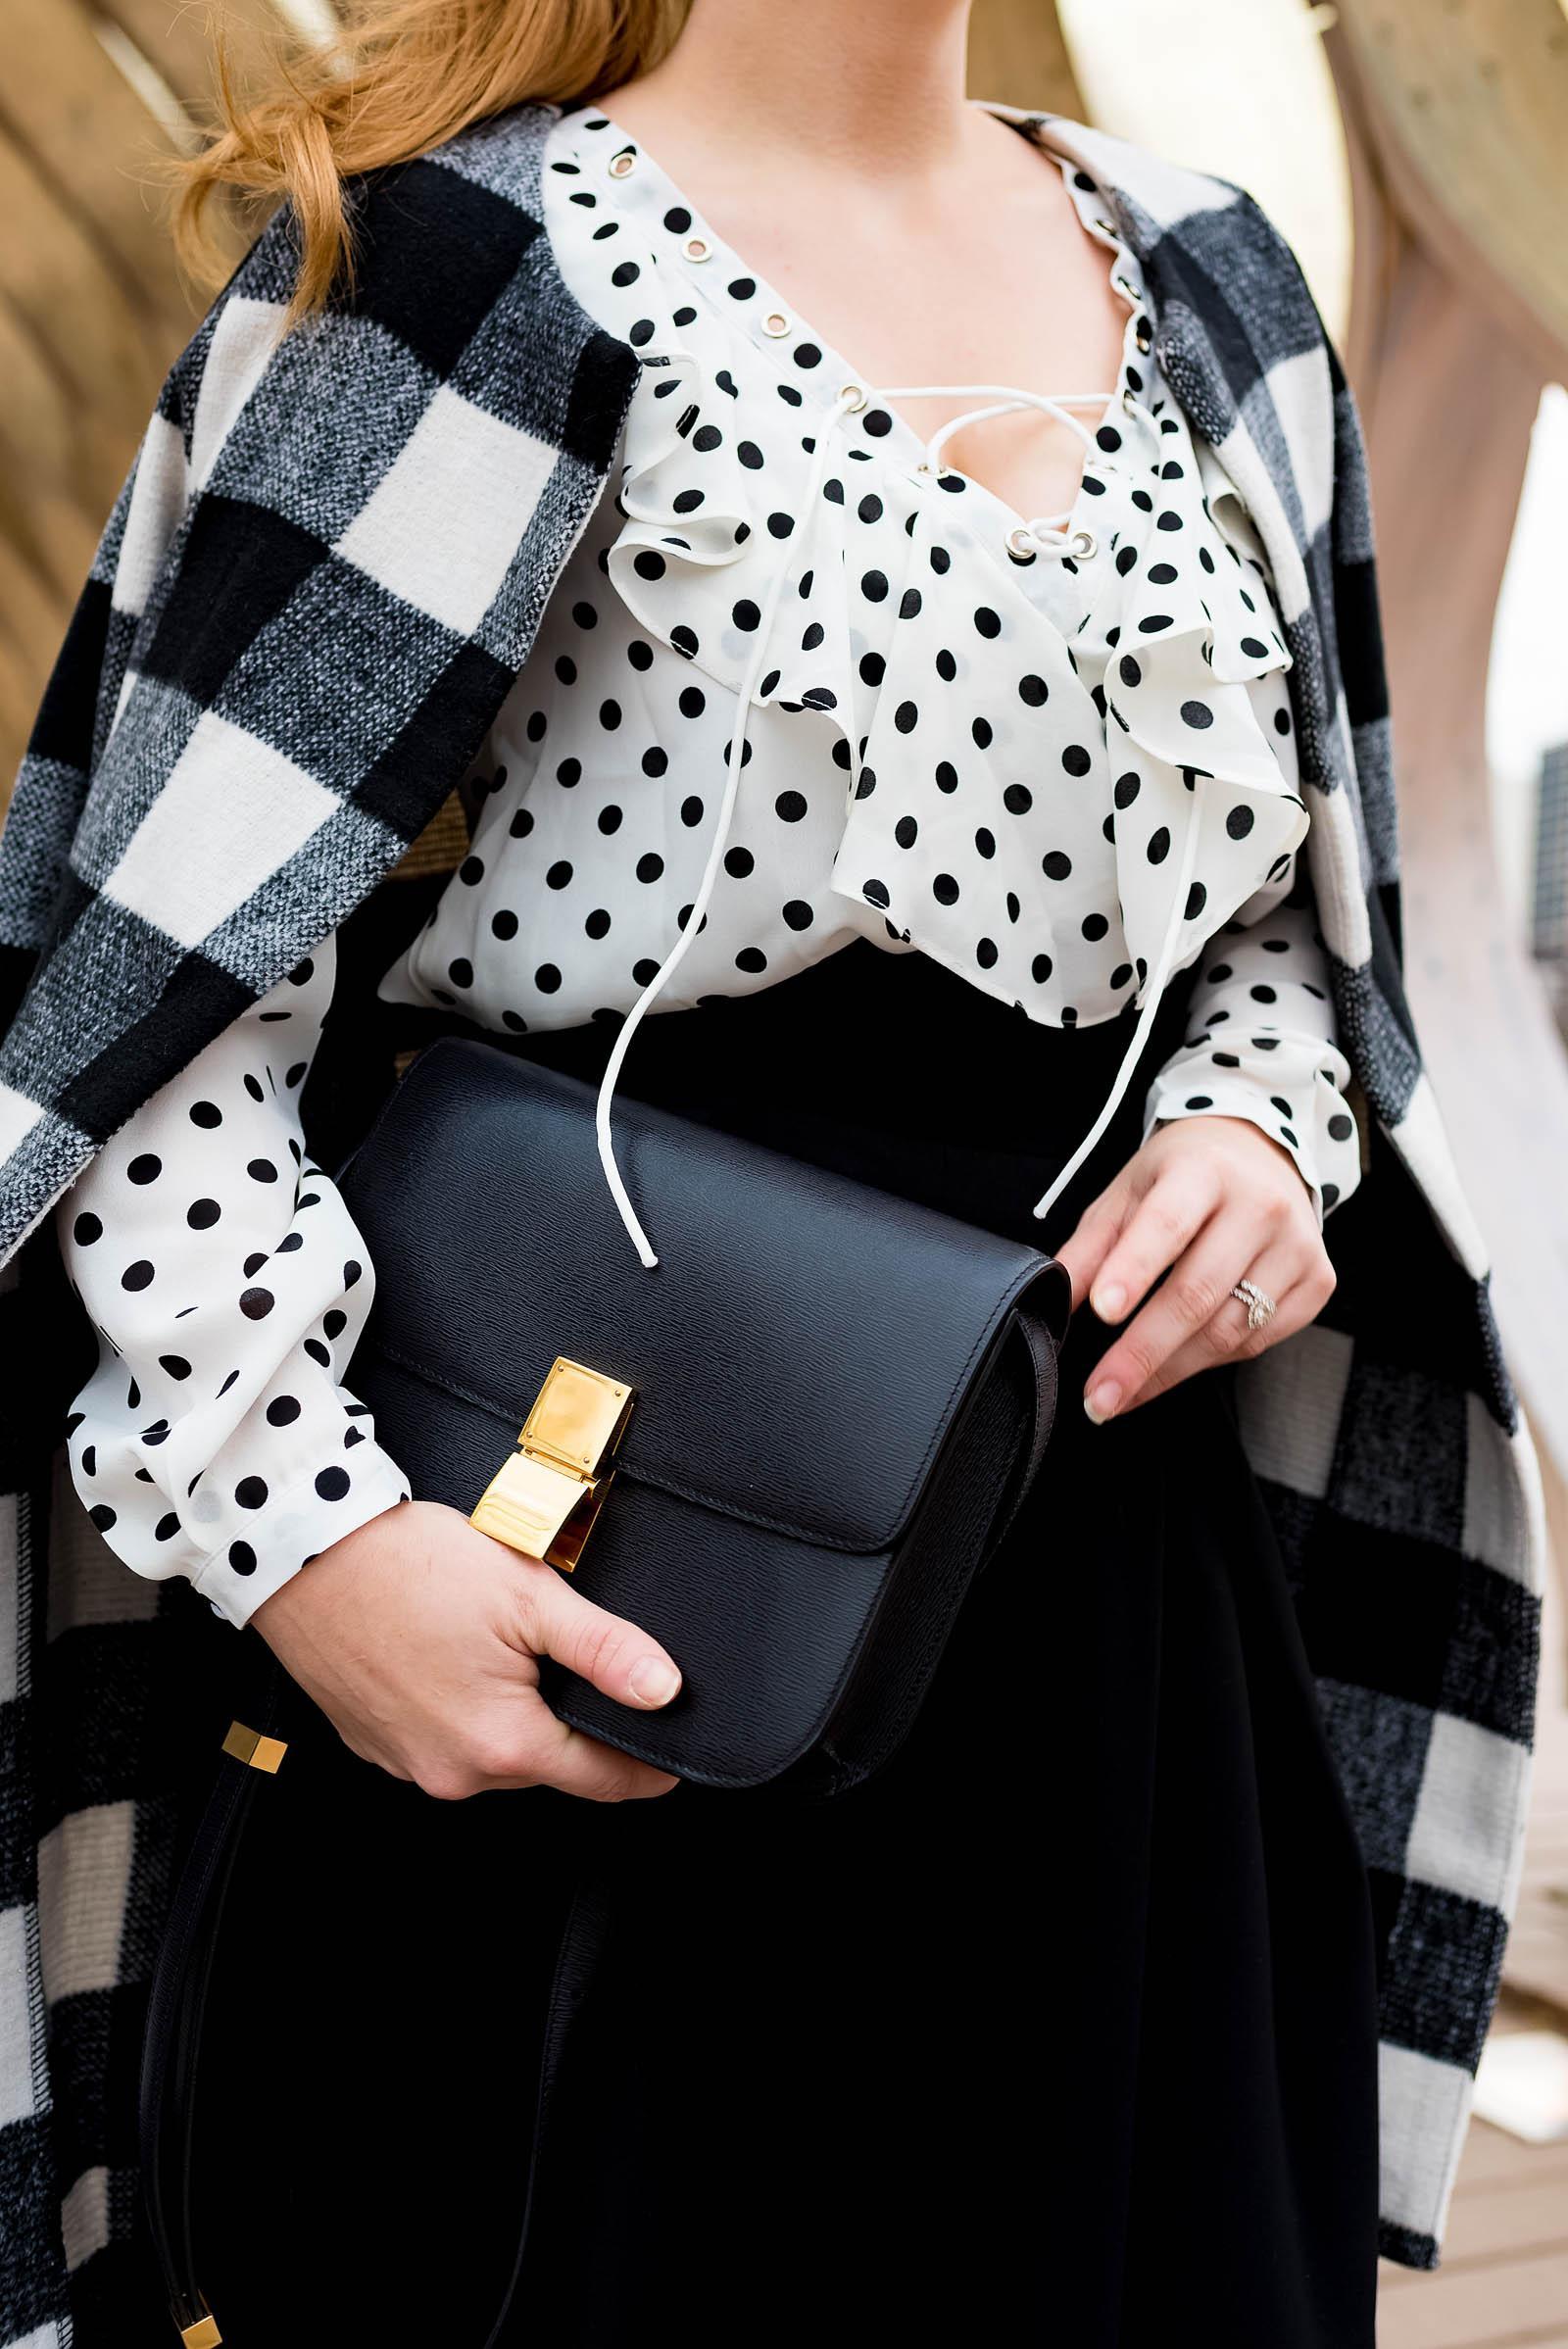 Plaid Polka Dot Outfit